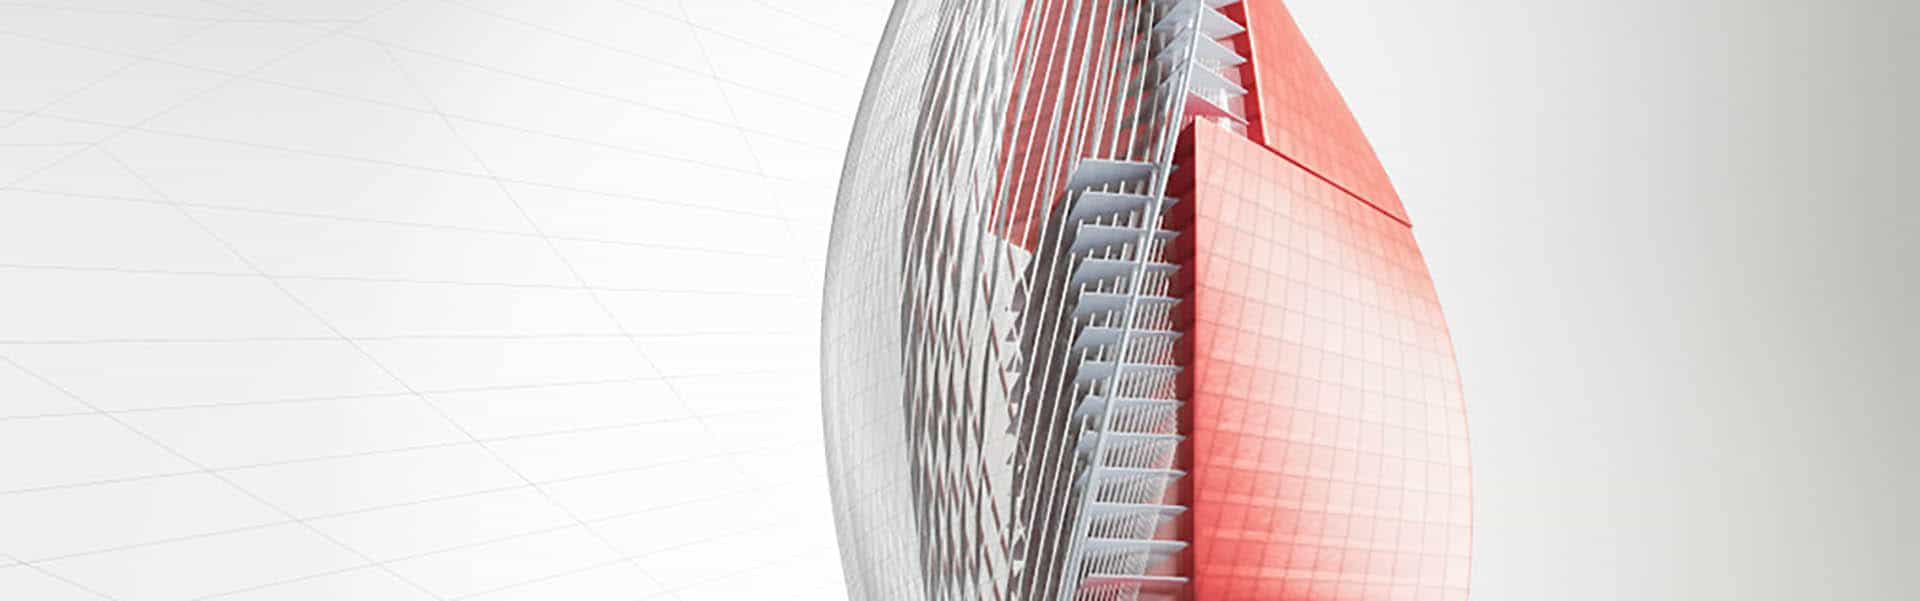 AutoCAD Architecture Produktbild